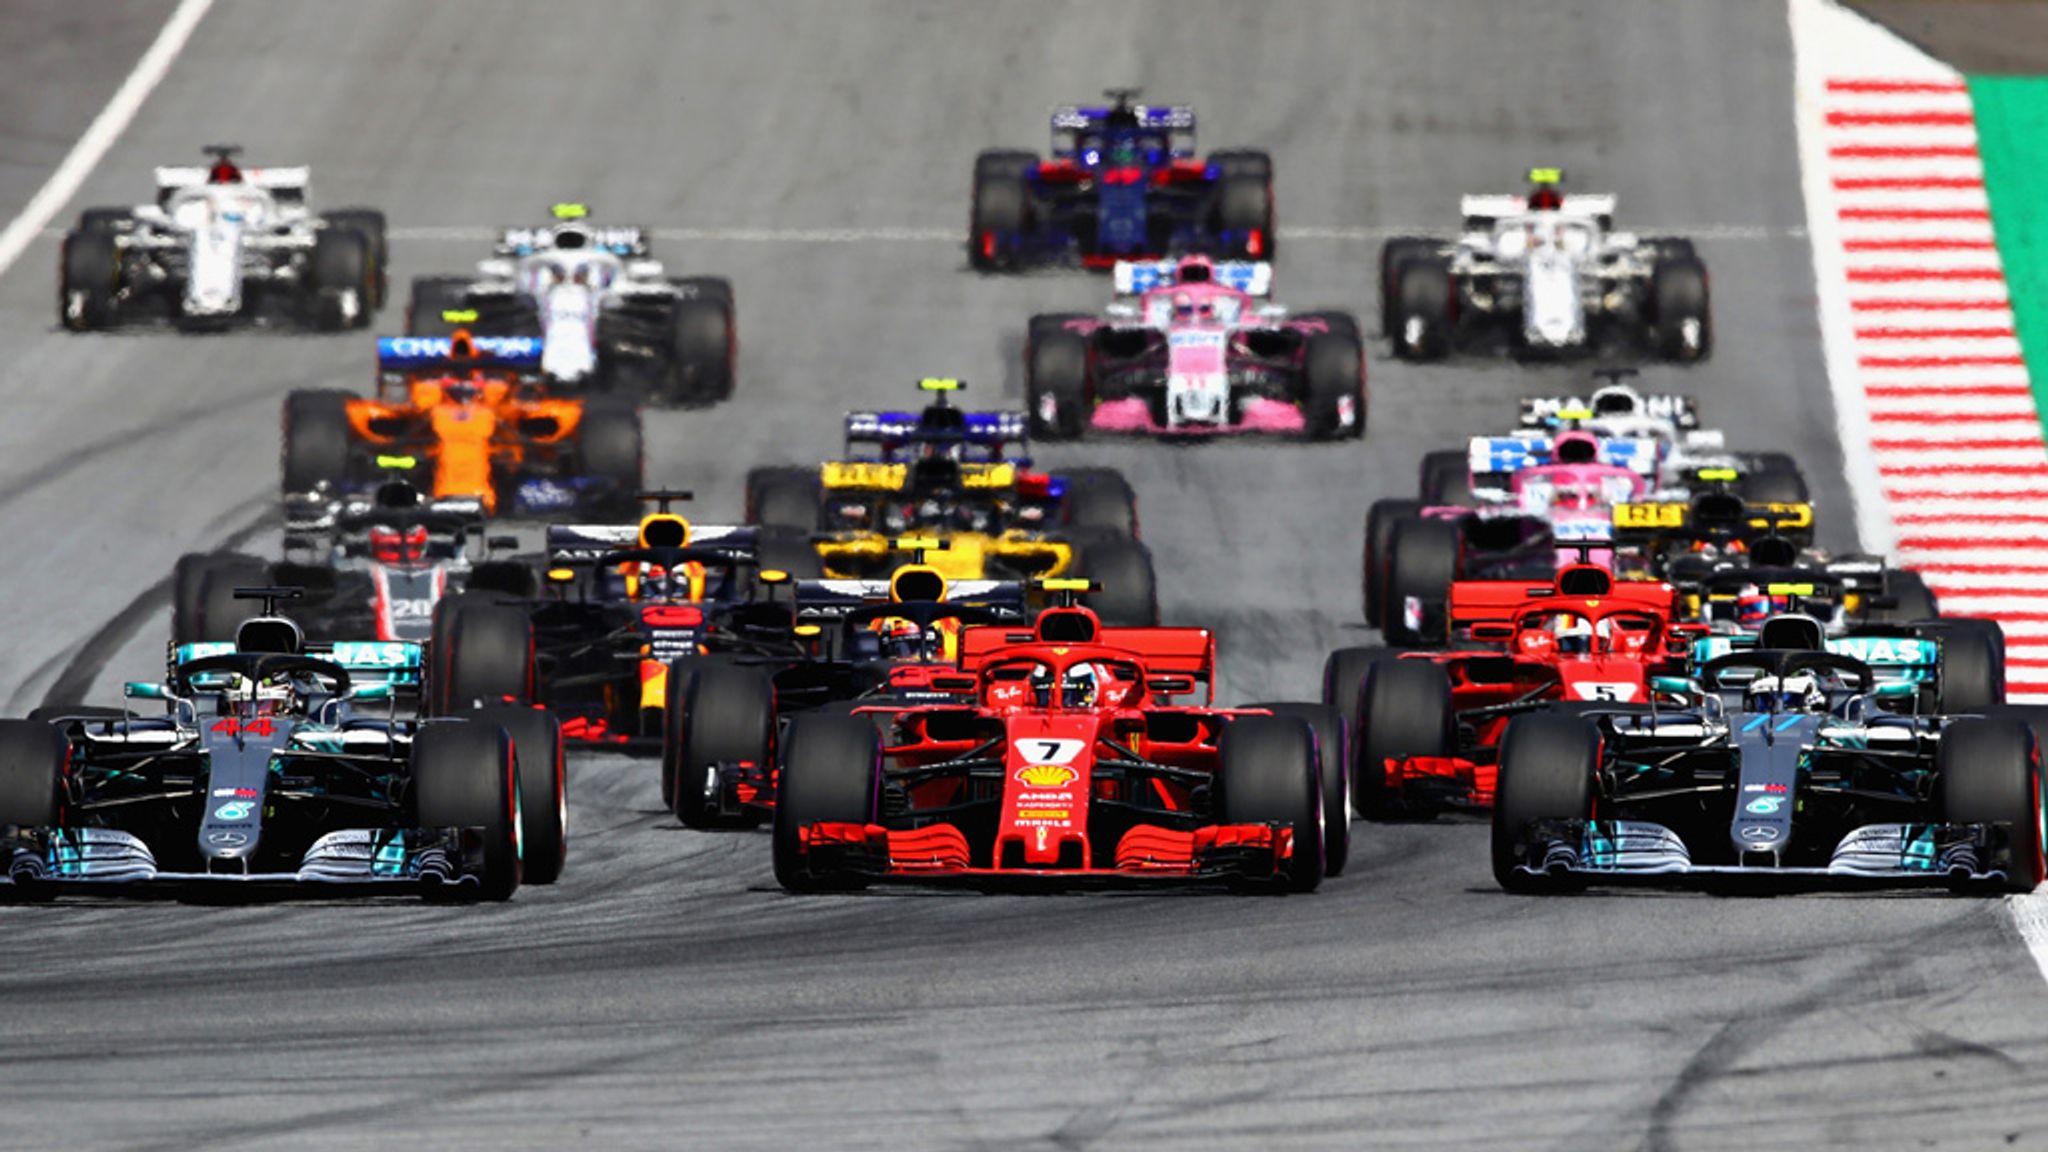 Calendario F1 2020 Sky.Vietnam Gp To Be Hosted In Hanoi From 2020 F1 Season F1 News